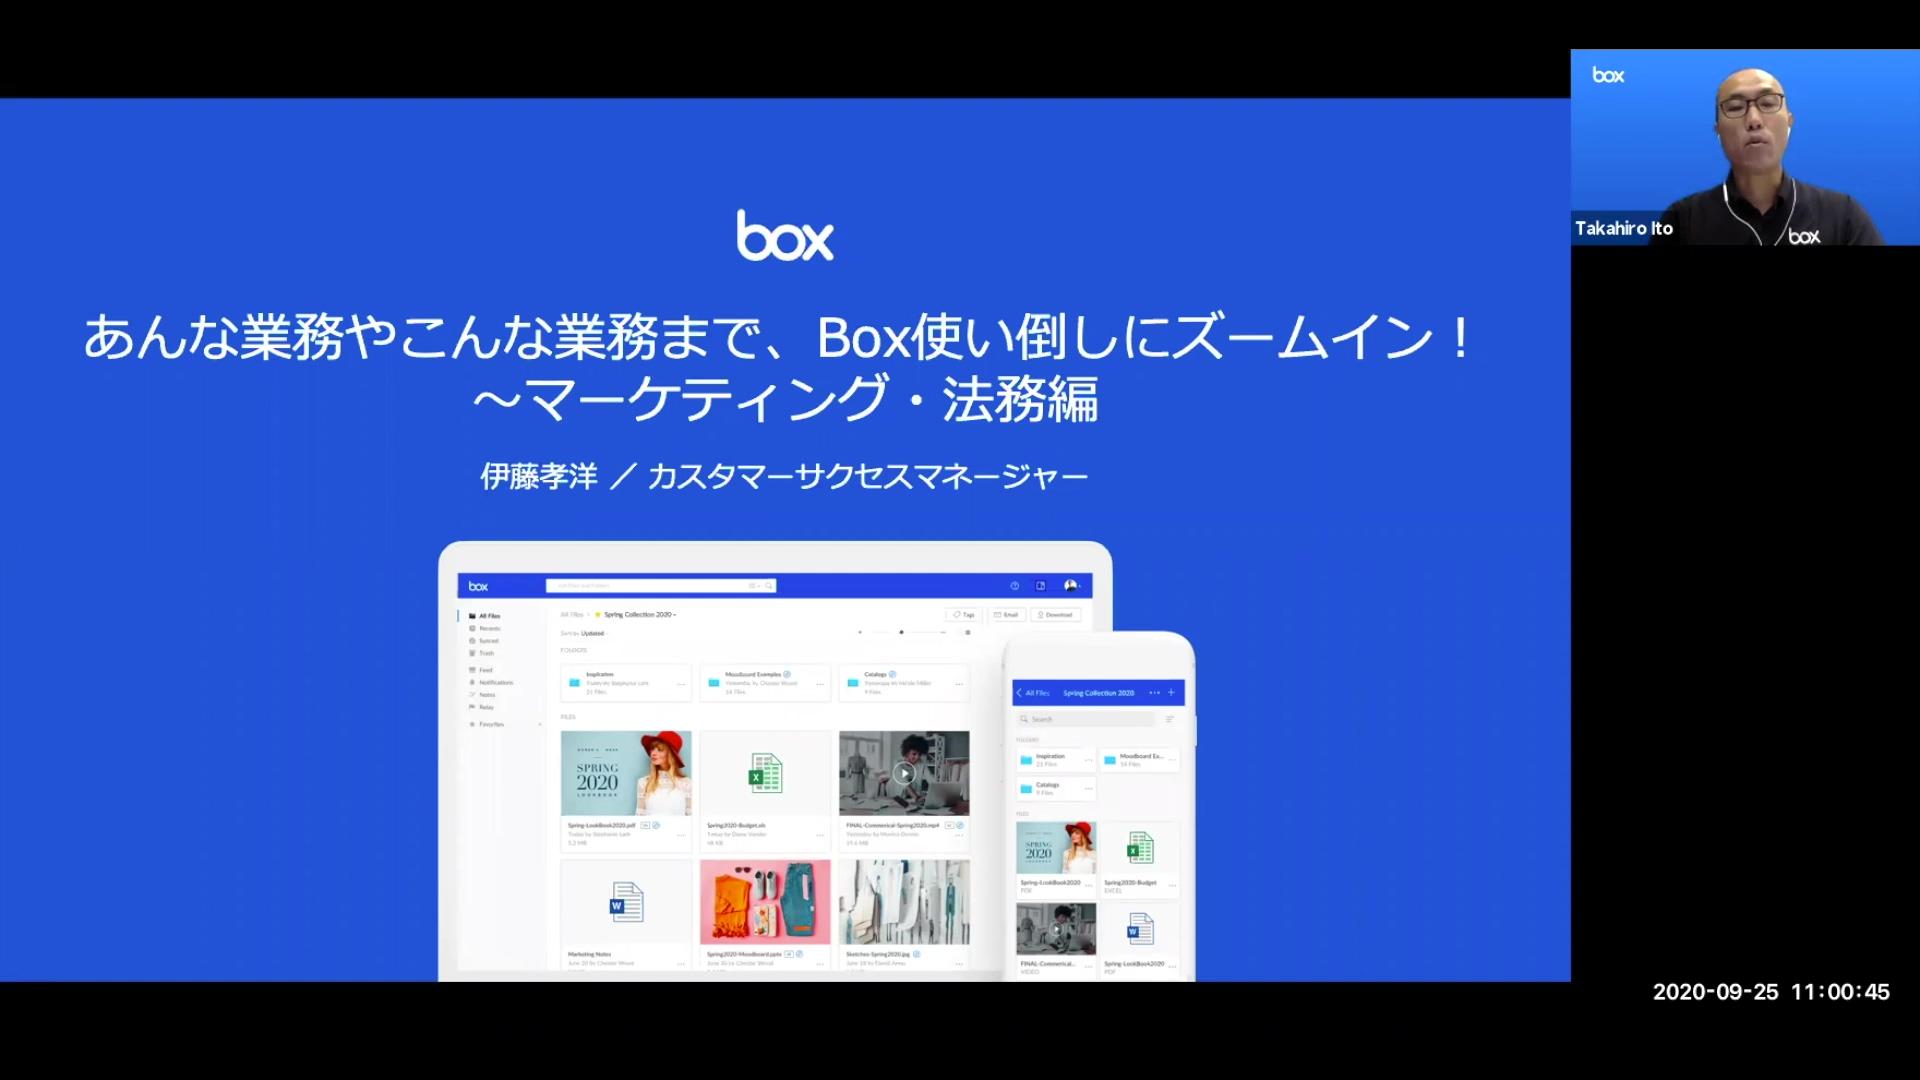 box-online-seminar-20200925